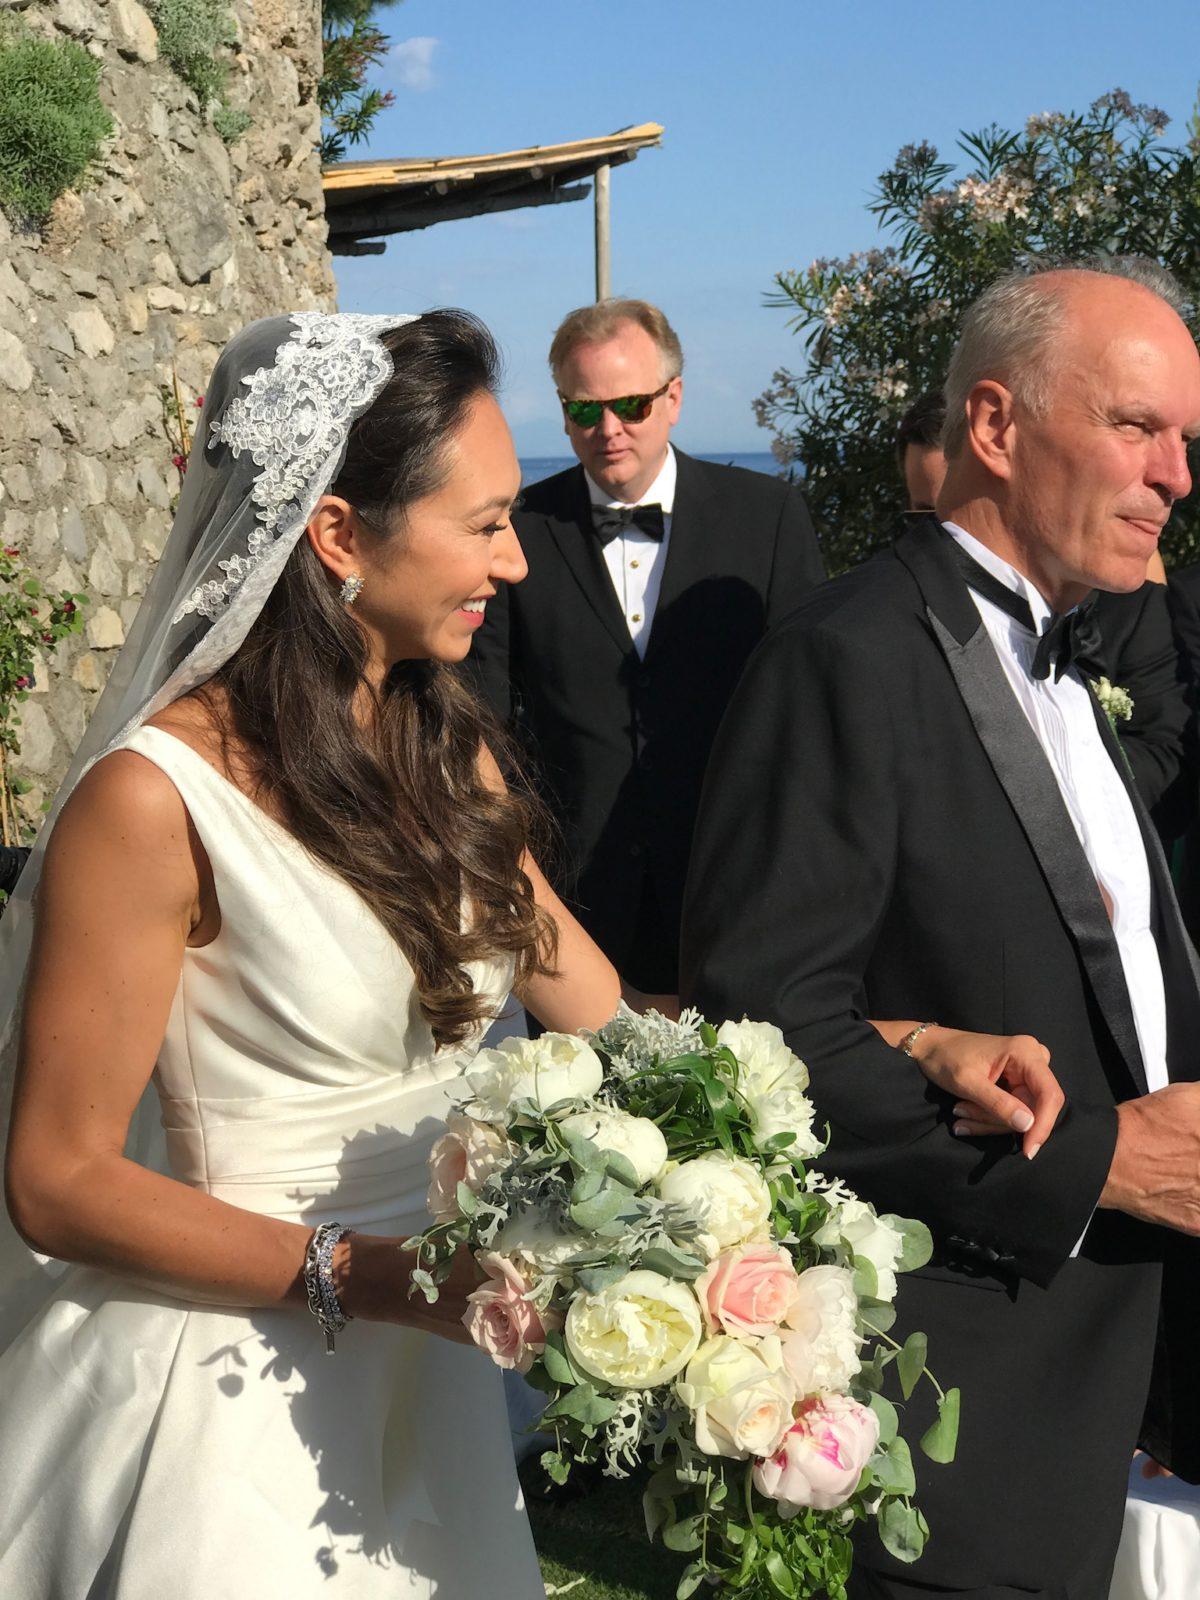 Nathalie and Benjamin Wedding in Positano Italy (17)